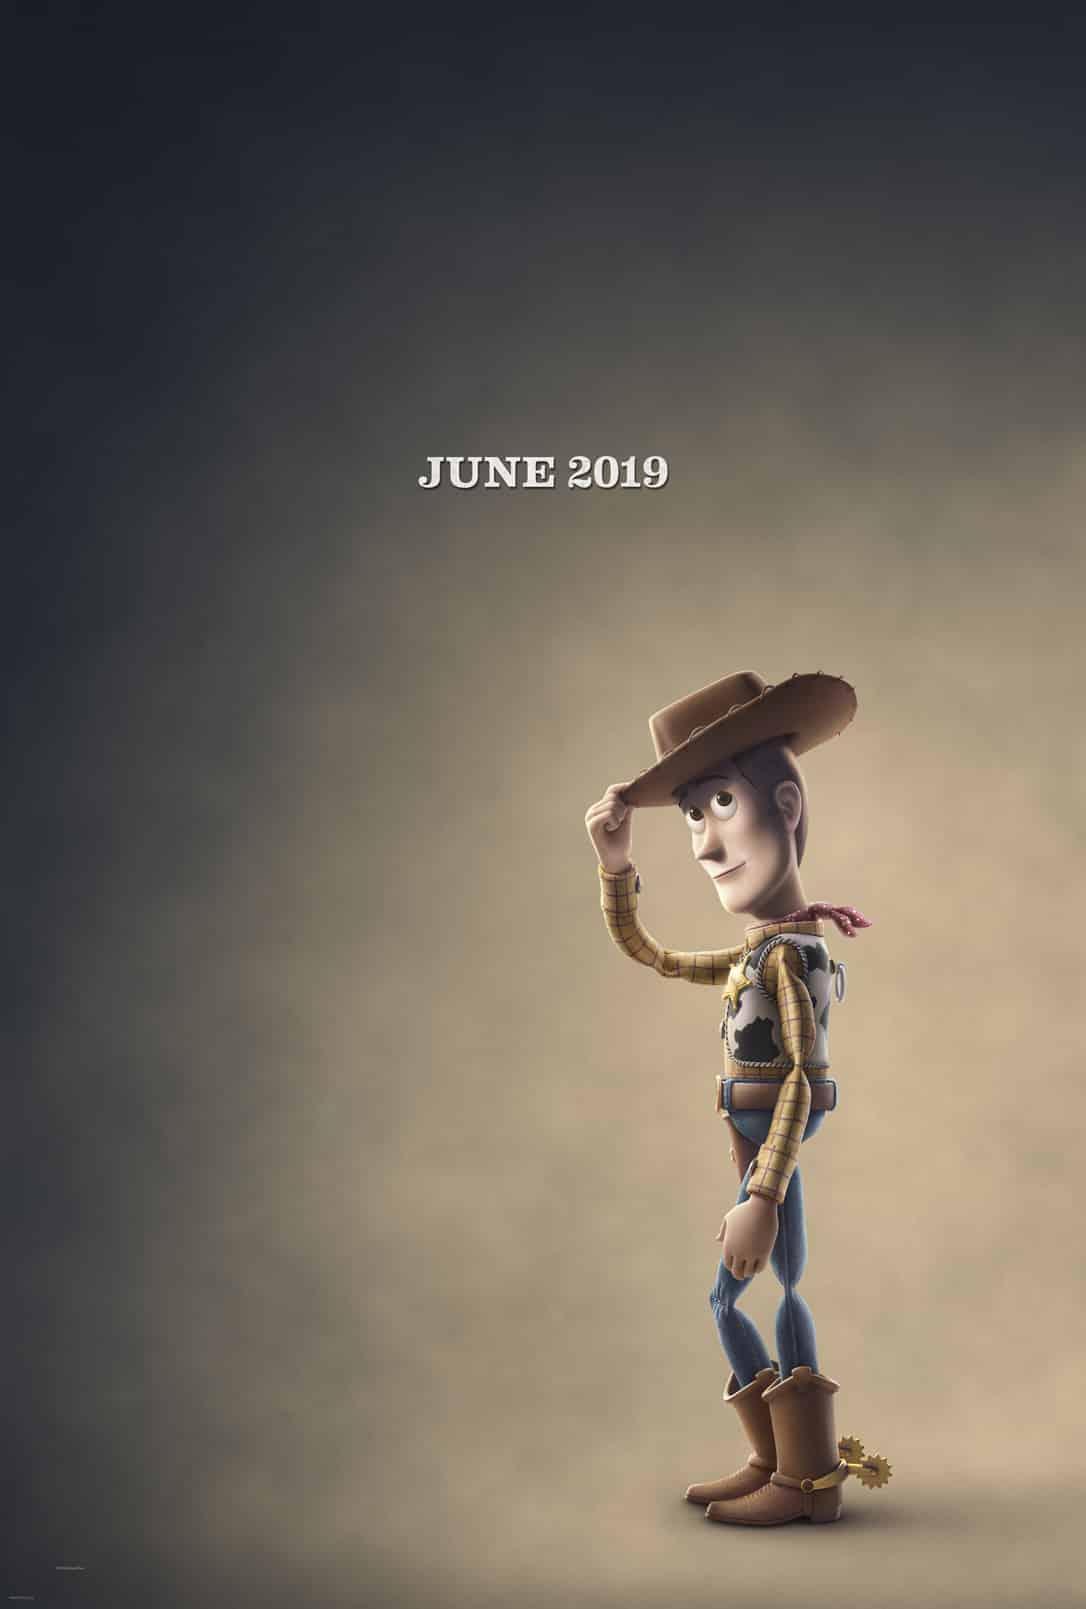 Oficiálny teaser plagát k filmu Toy Story 4